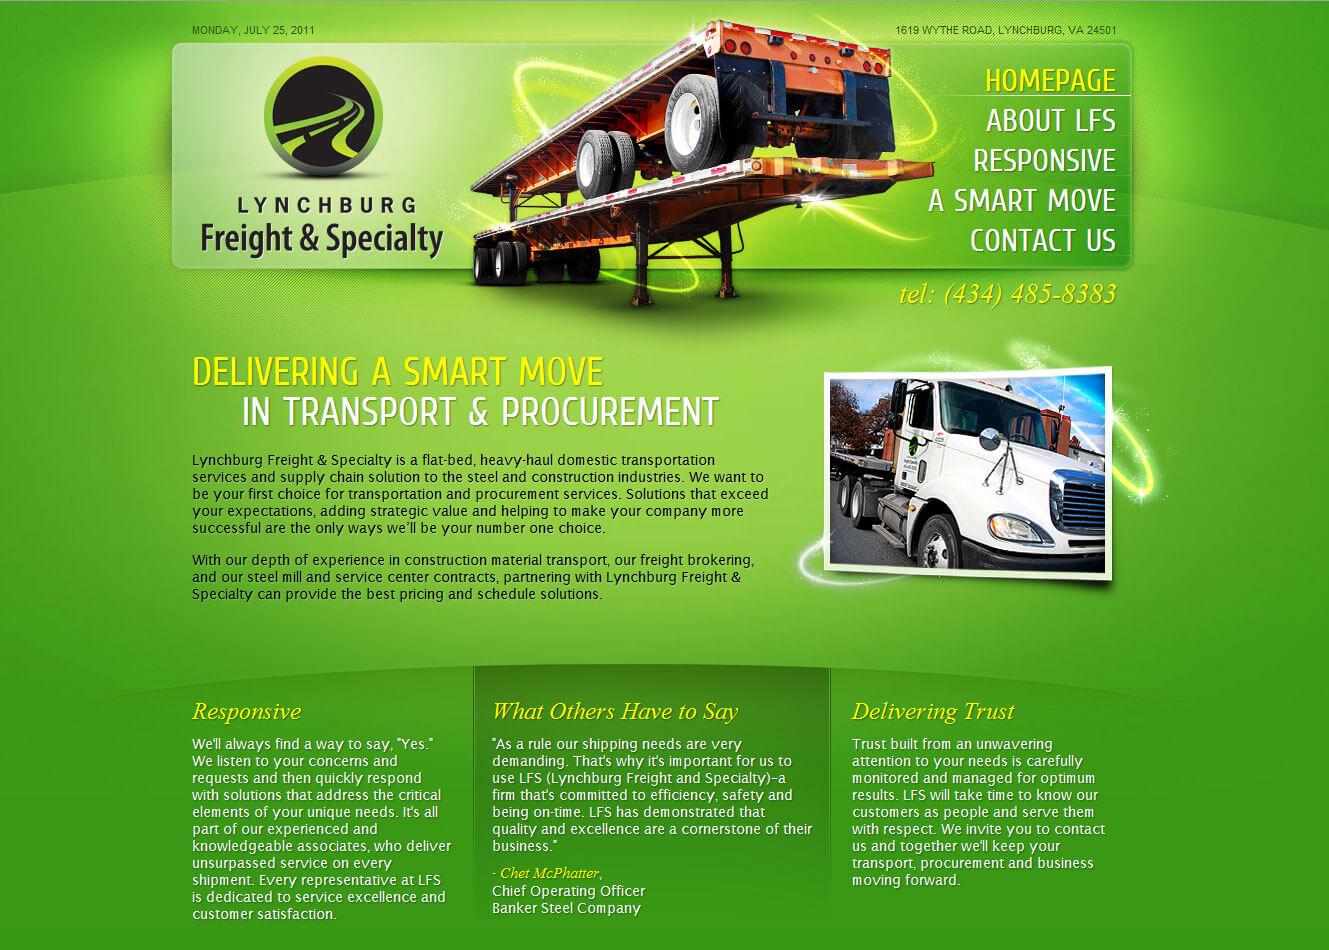 Lynchburg Freight & Specialty